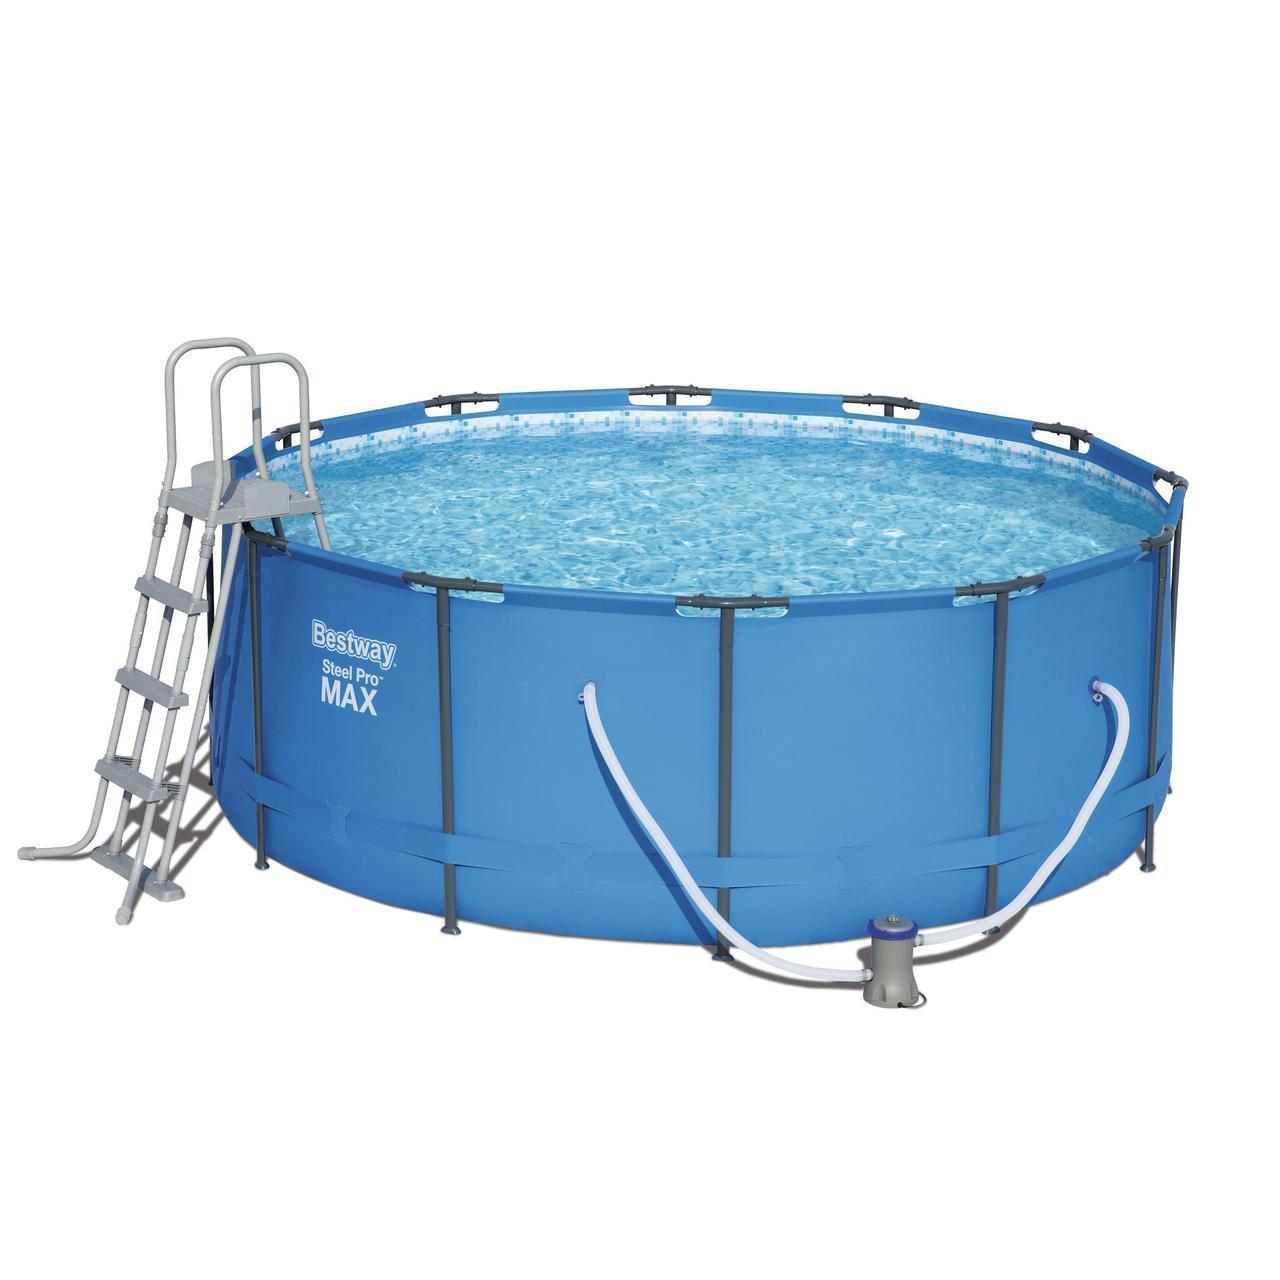 Каркасный бассейн MAX Bestway 15427 - 0, 366 х 133 см